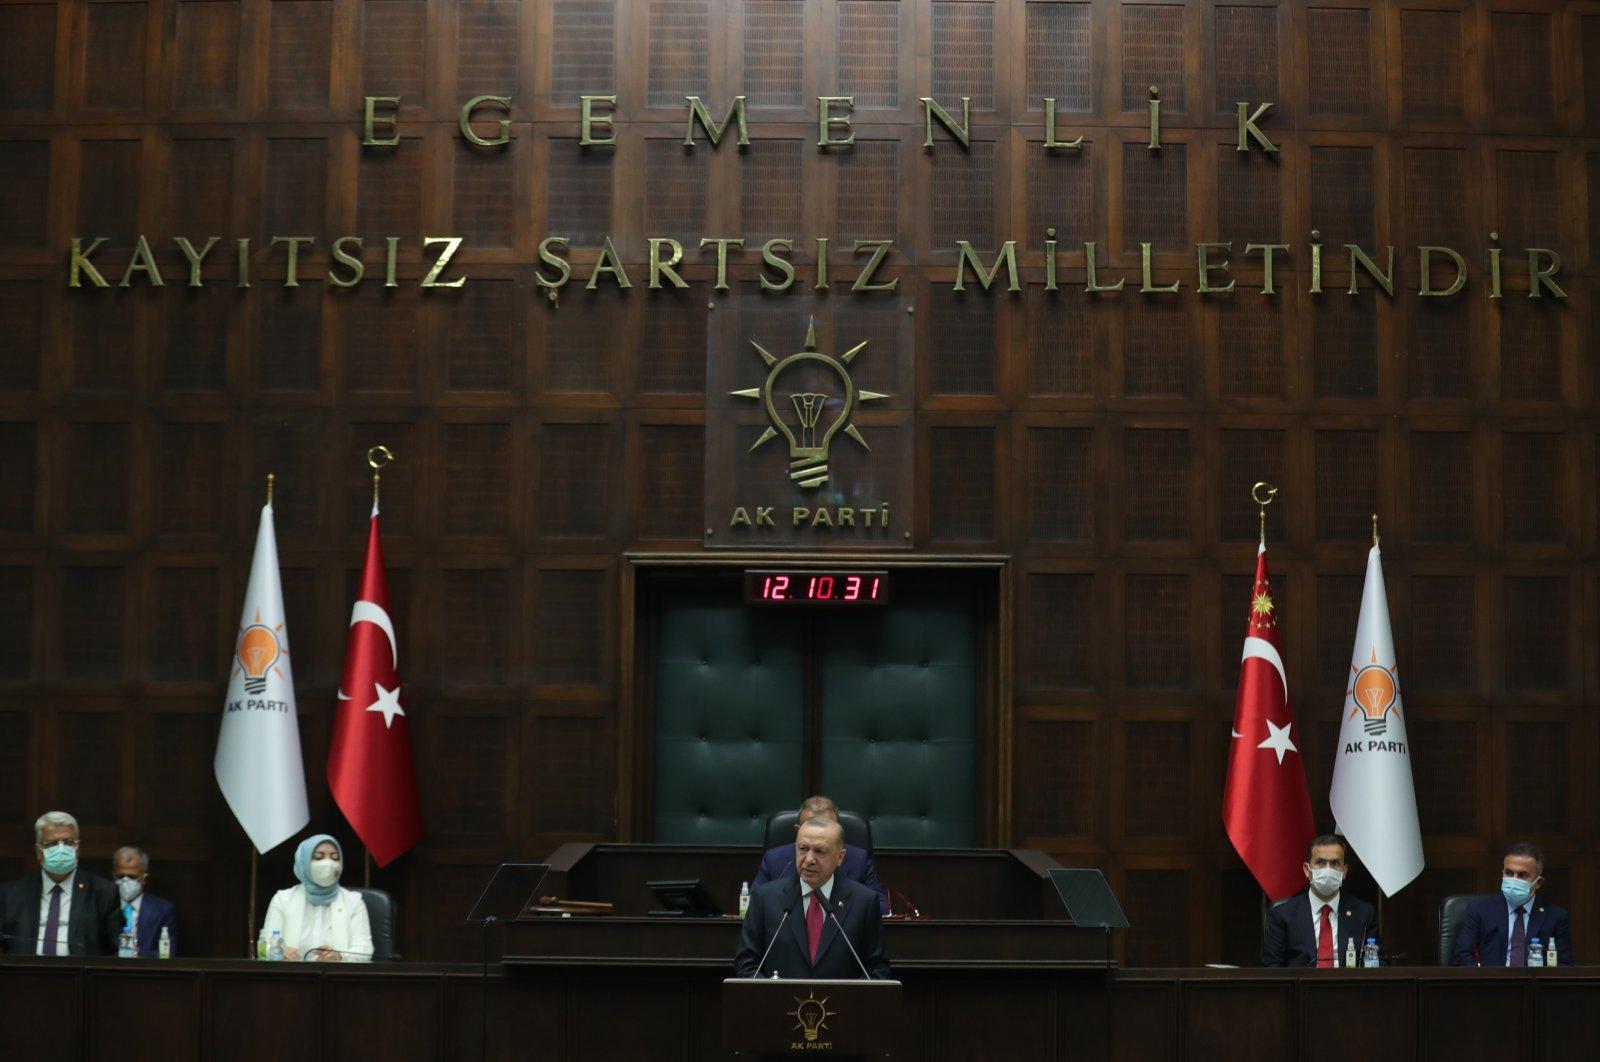 President Recep Tayyip Erdoğan speaks at an AK Party parliamentary group meeting in the Turkish Parliament in Ankara, Turkey, July 14, 2021. (AA Photo)